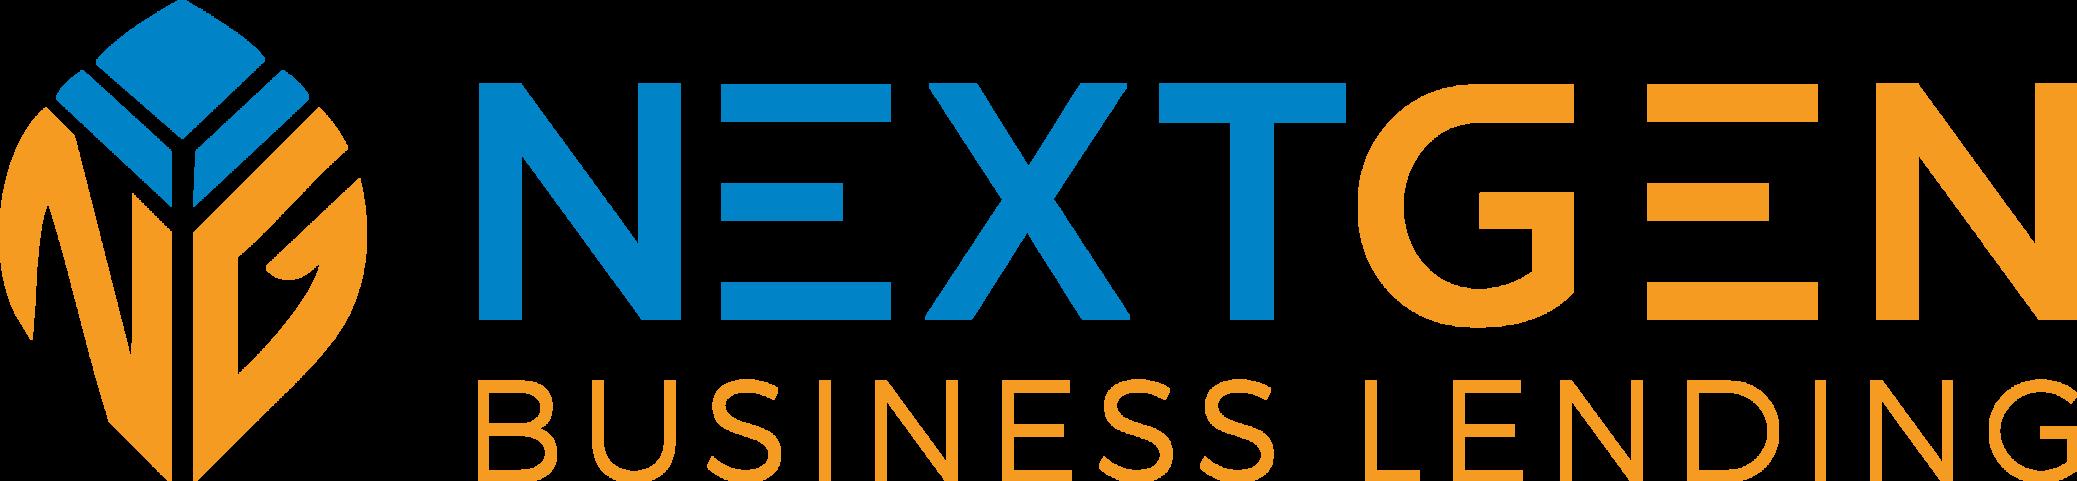 NextGen Business Lending logo